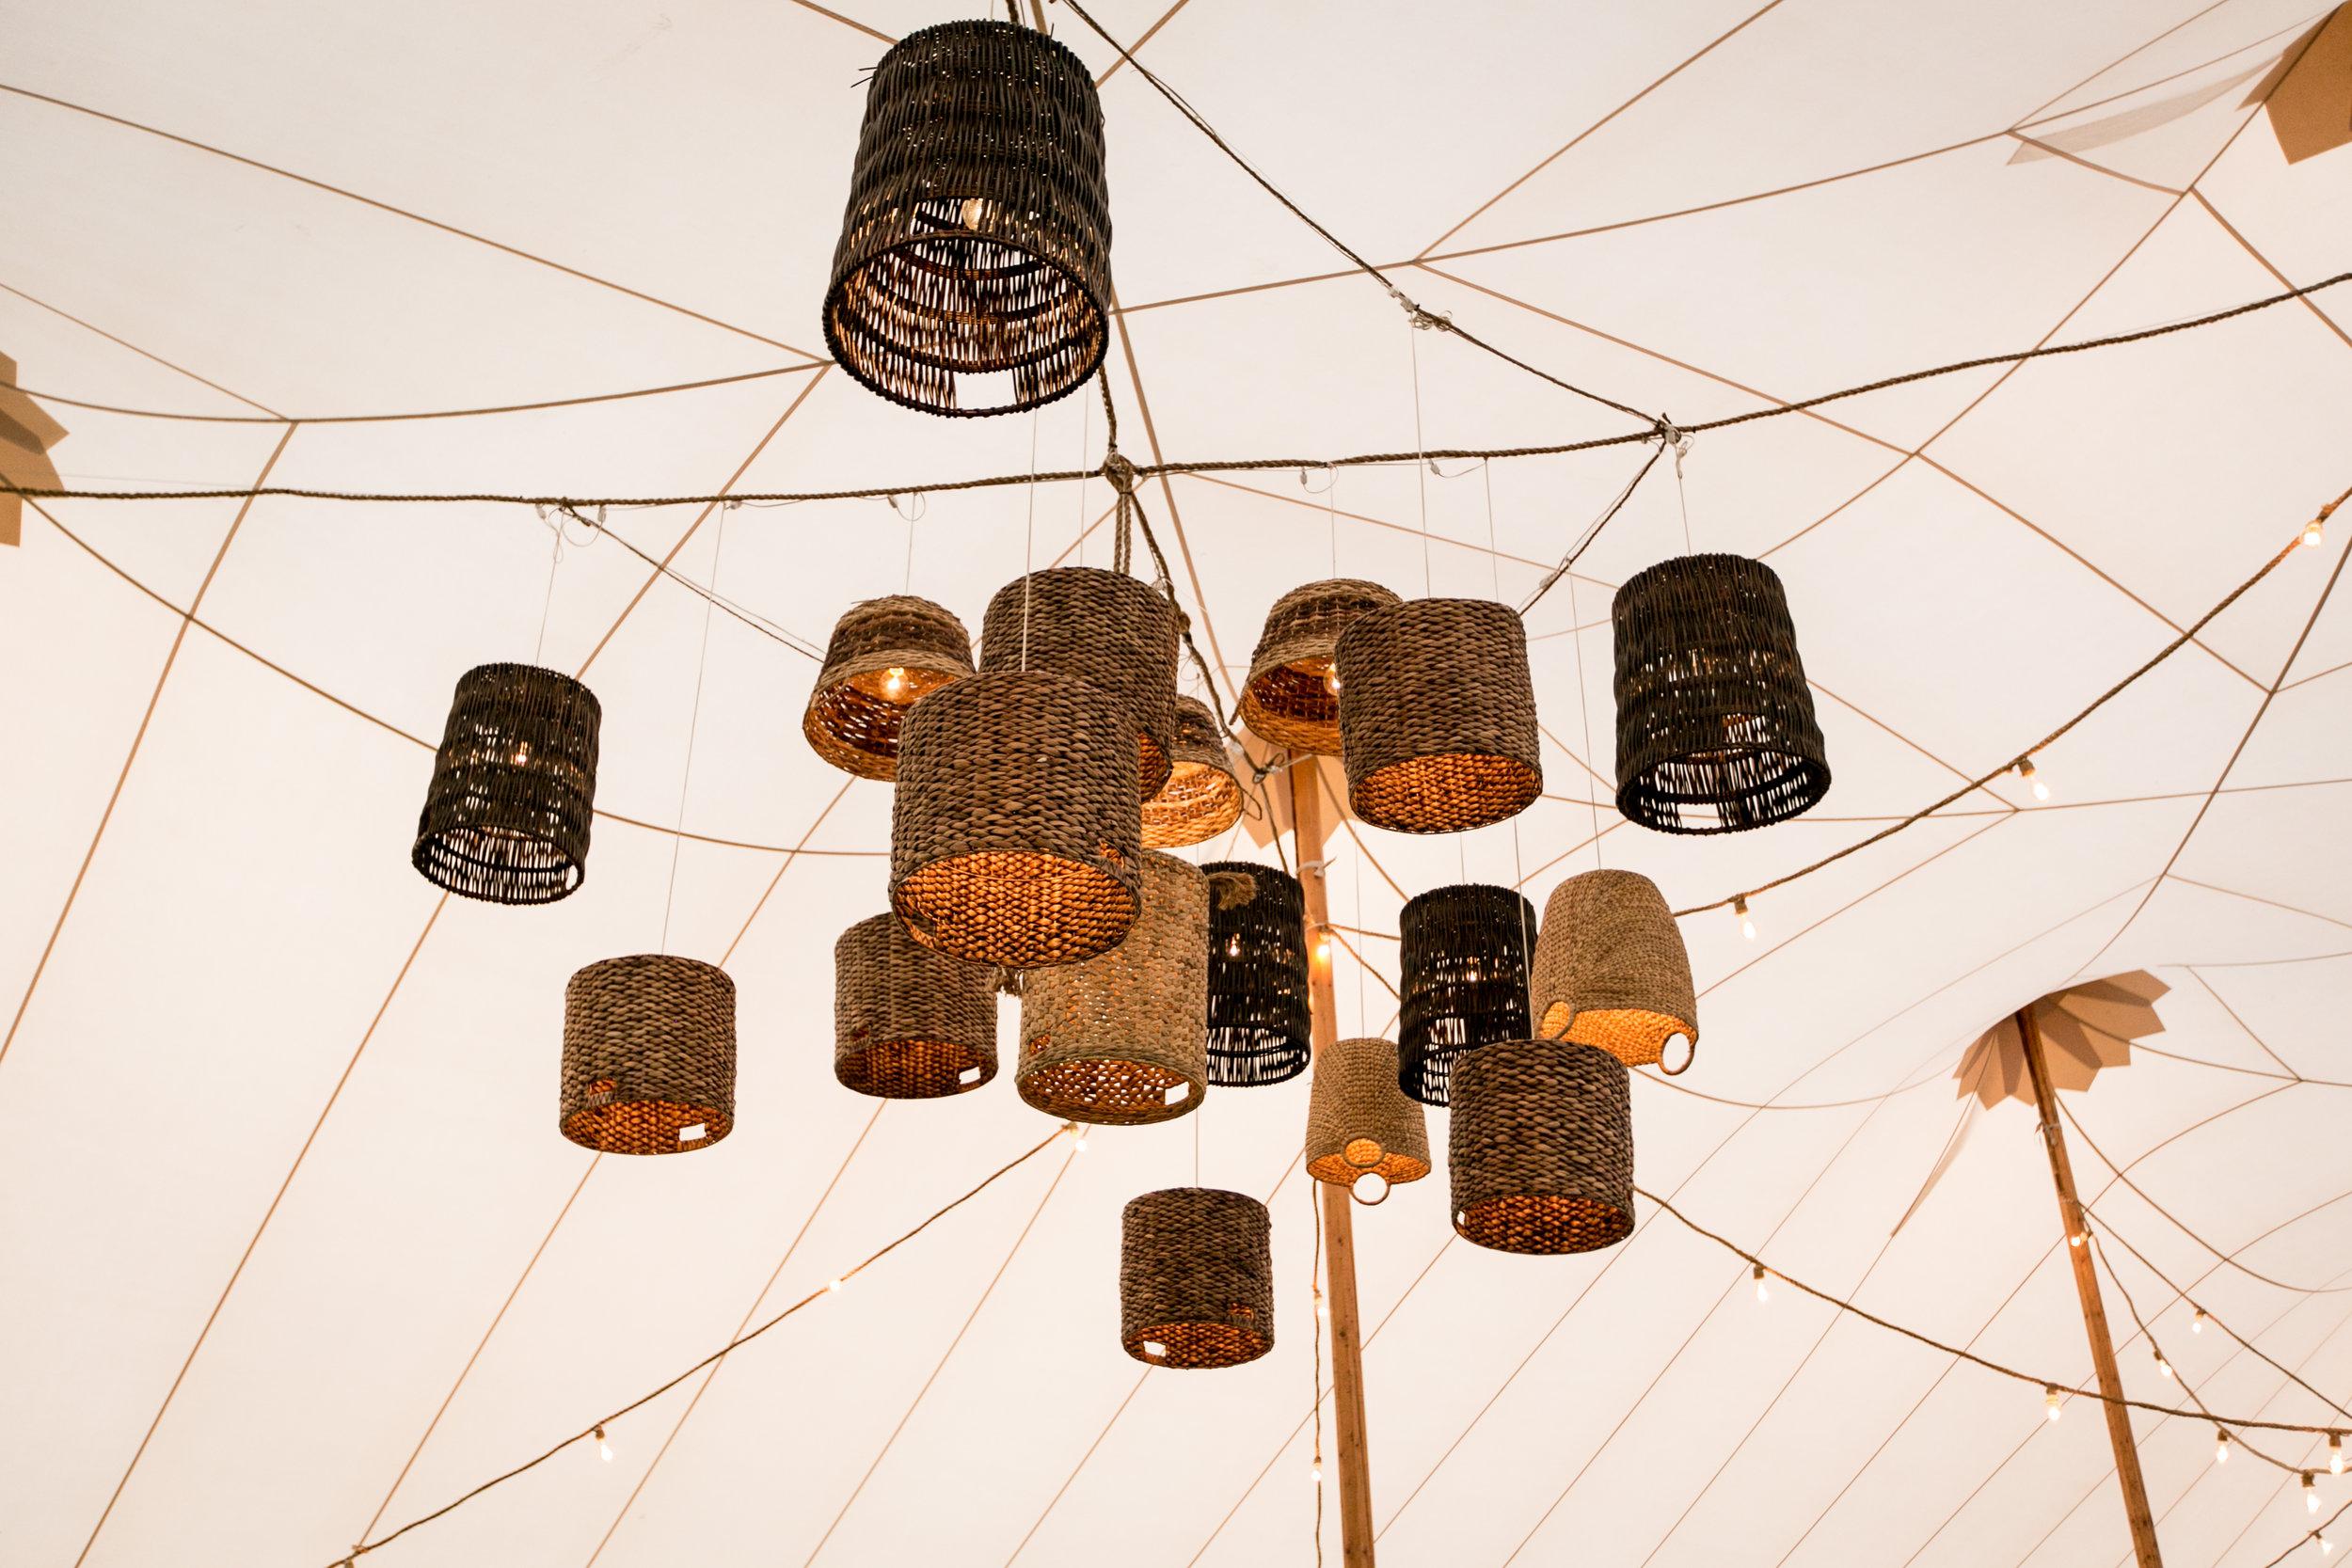 Basket Lights by Social Decor.